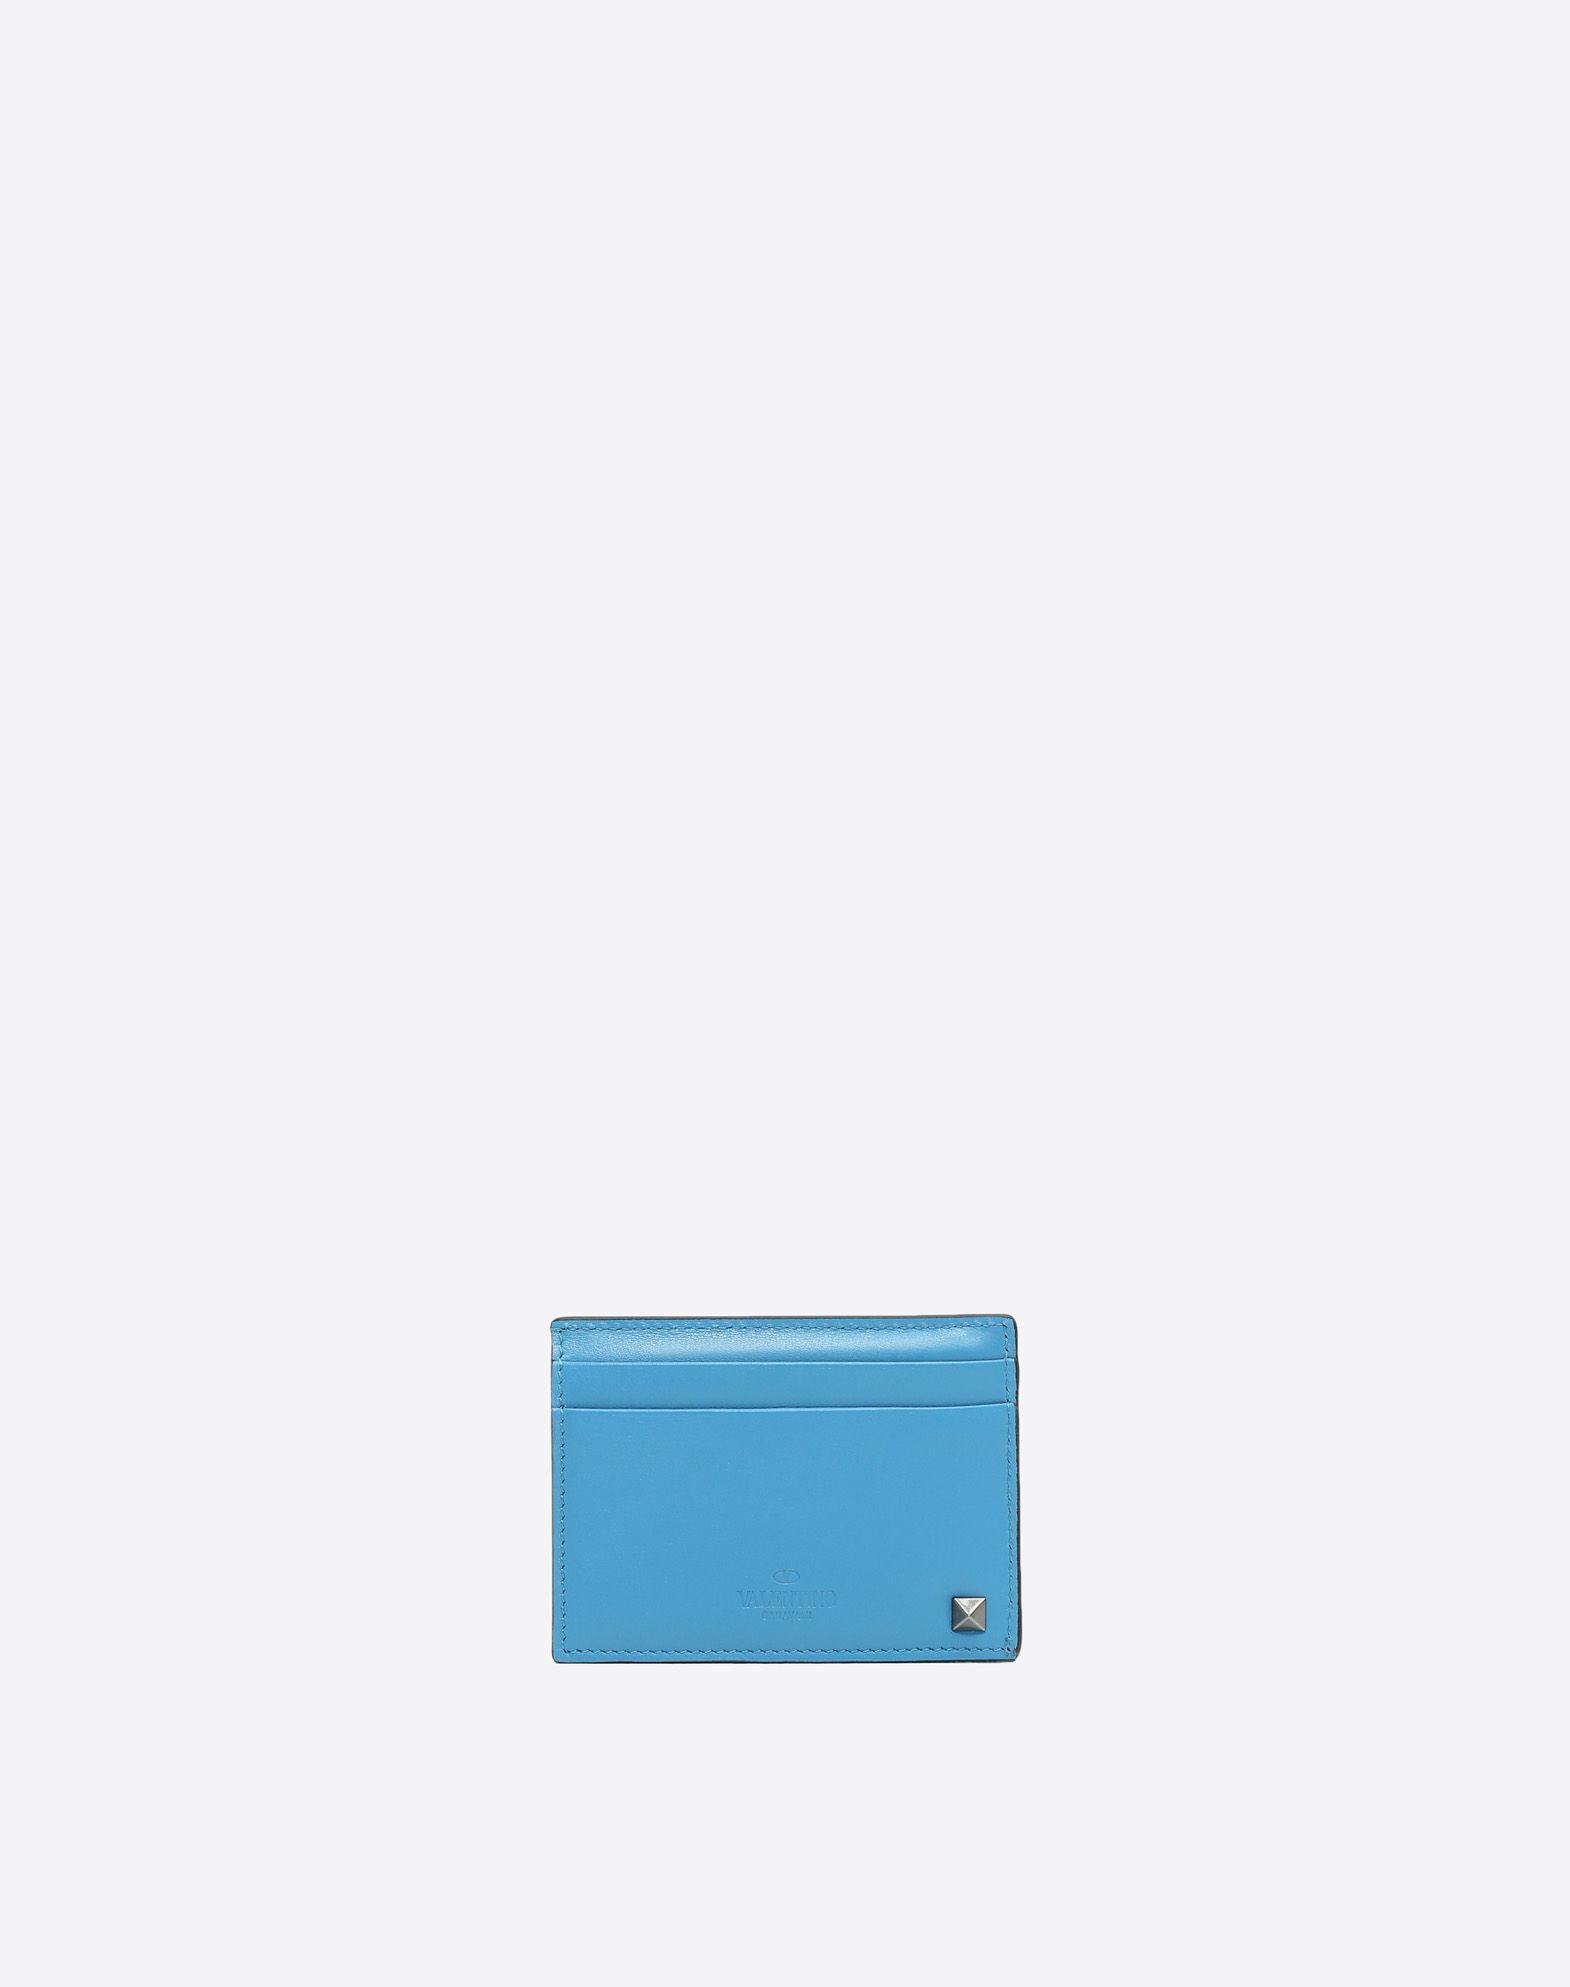 VALENTINO GARAVANI UOMO PY2P0523VH3 0G9 零钱袋与卡夹 U d